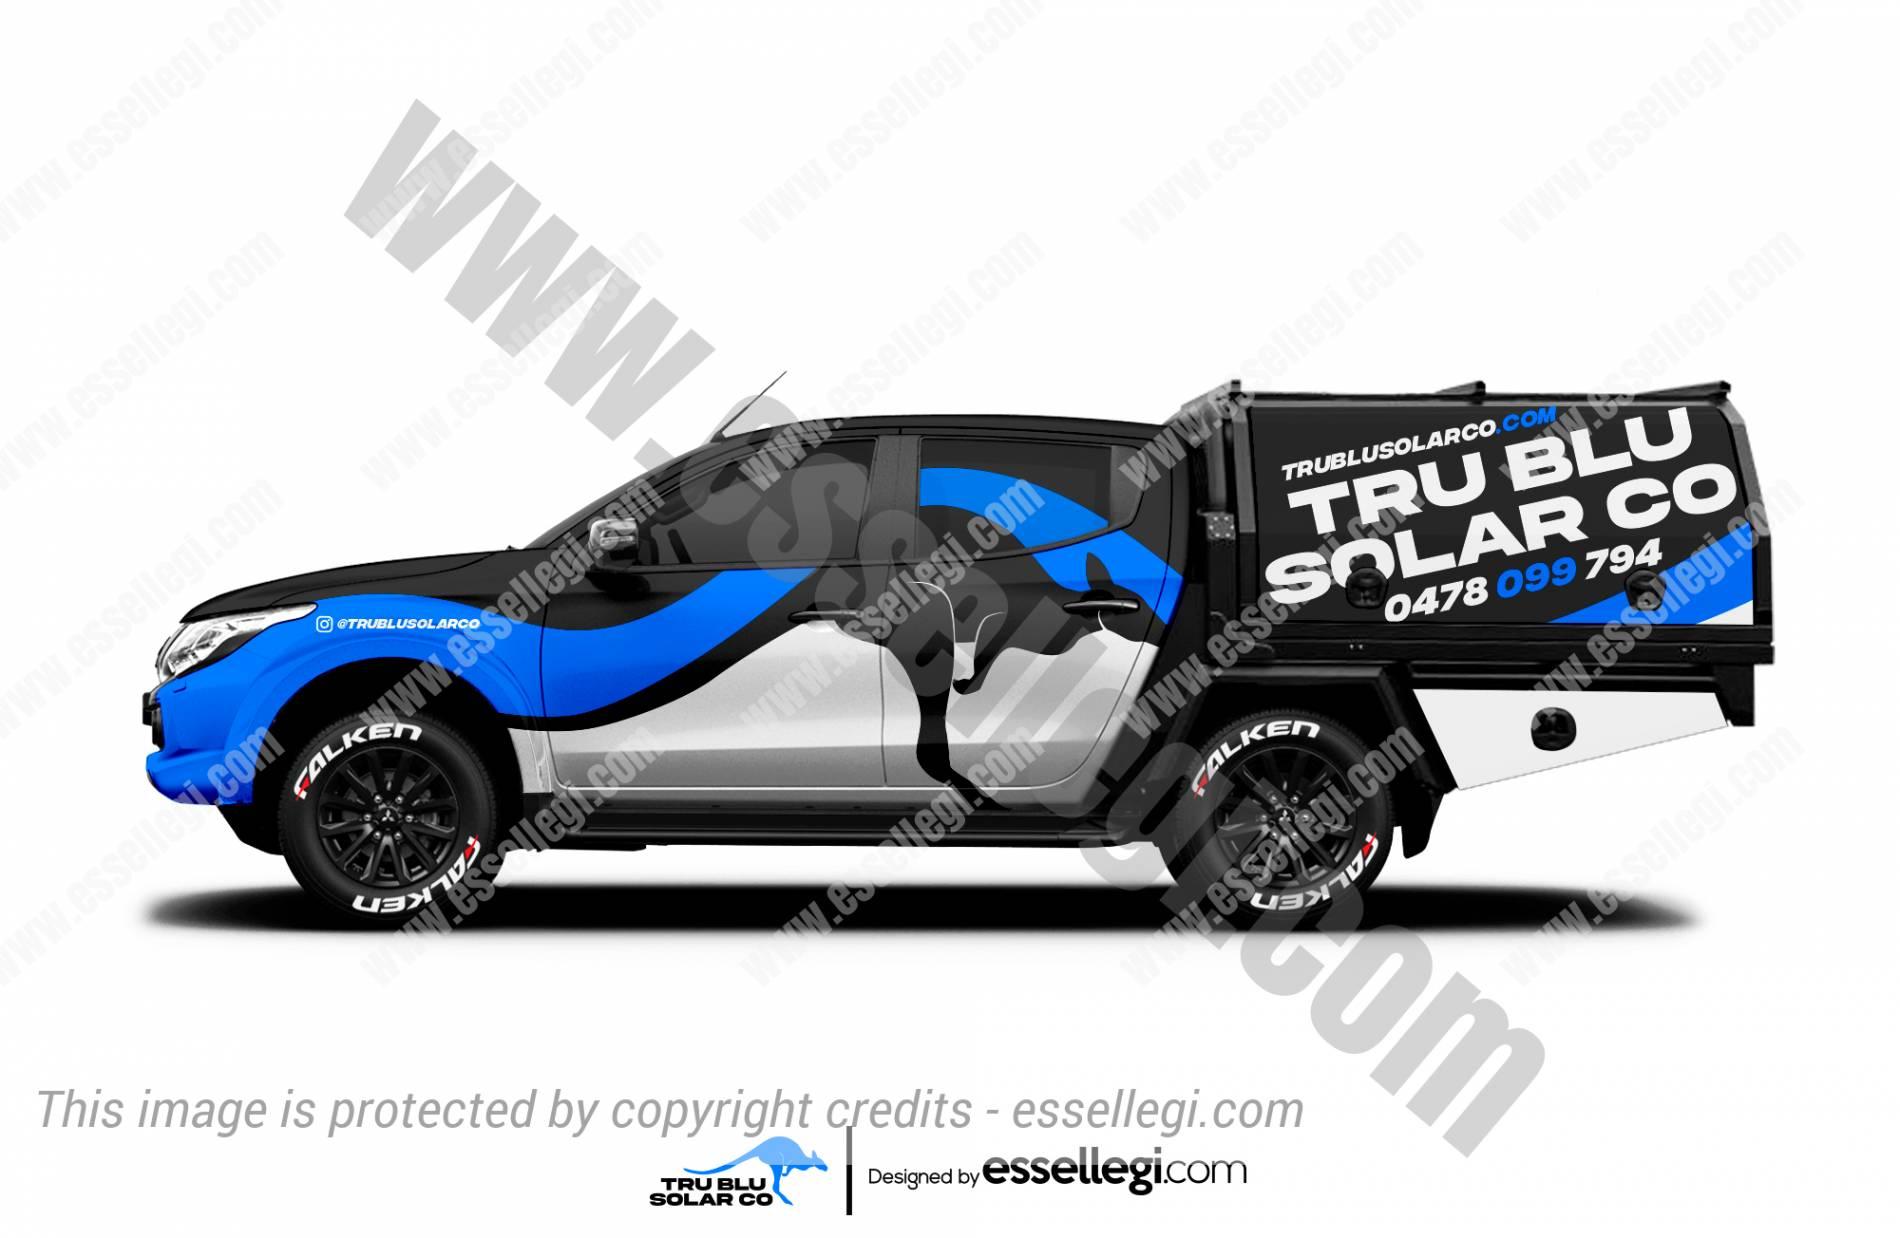 Mitsubishi L200 Triton Wrap Design. Mitsubishi L200 Triton Wrap | Truck Wrap Design by Essellegi. Truck Signs, Van Signage, Van Wrapping, Van Signwriting, Van Wrap Designer, Signs for Van, Van Logo, Van Graphic by Essellegi.